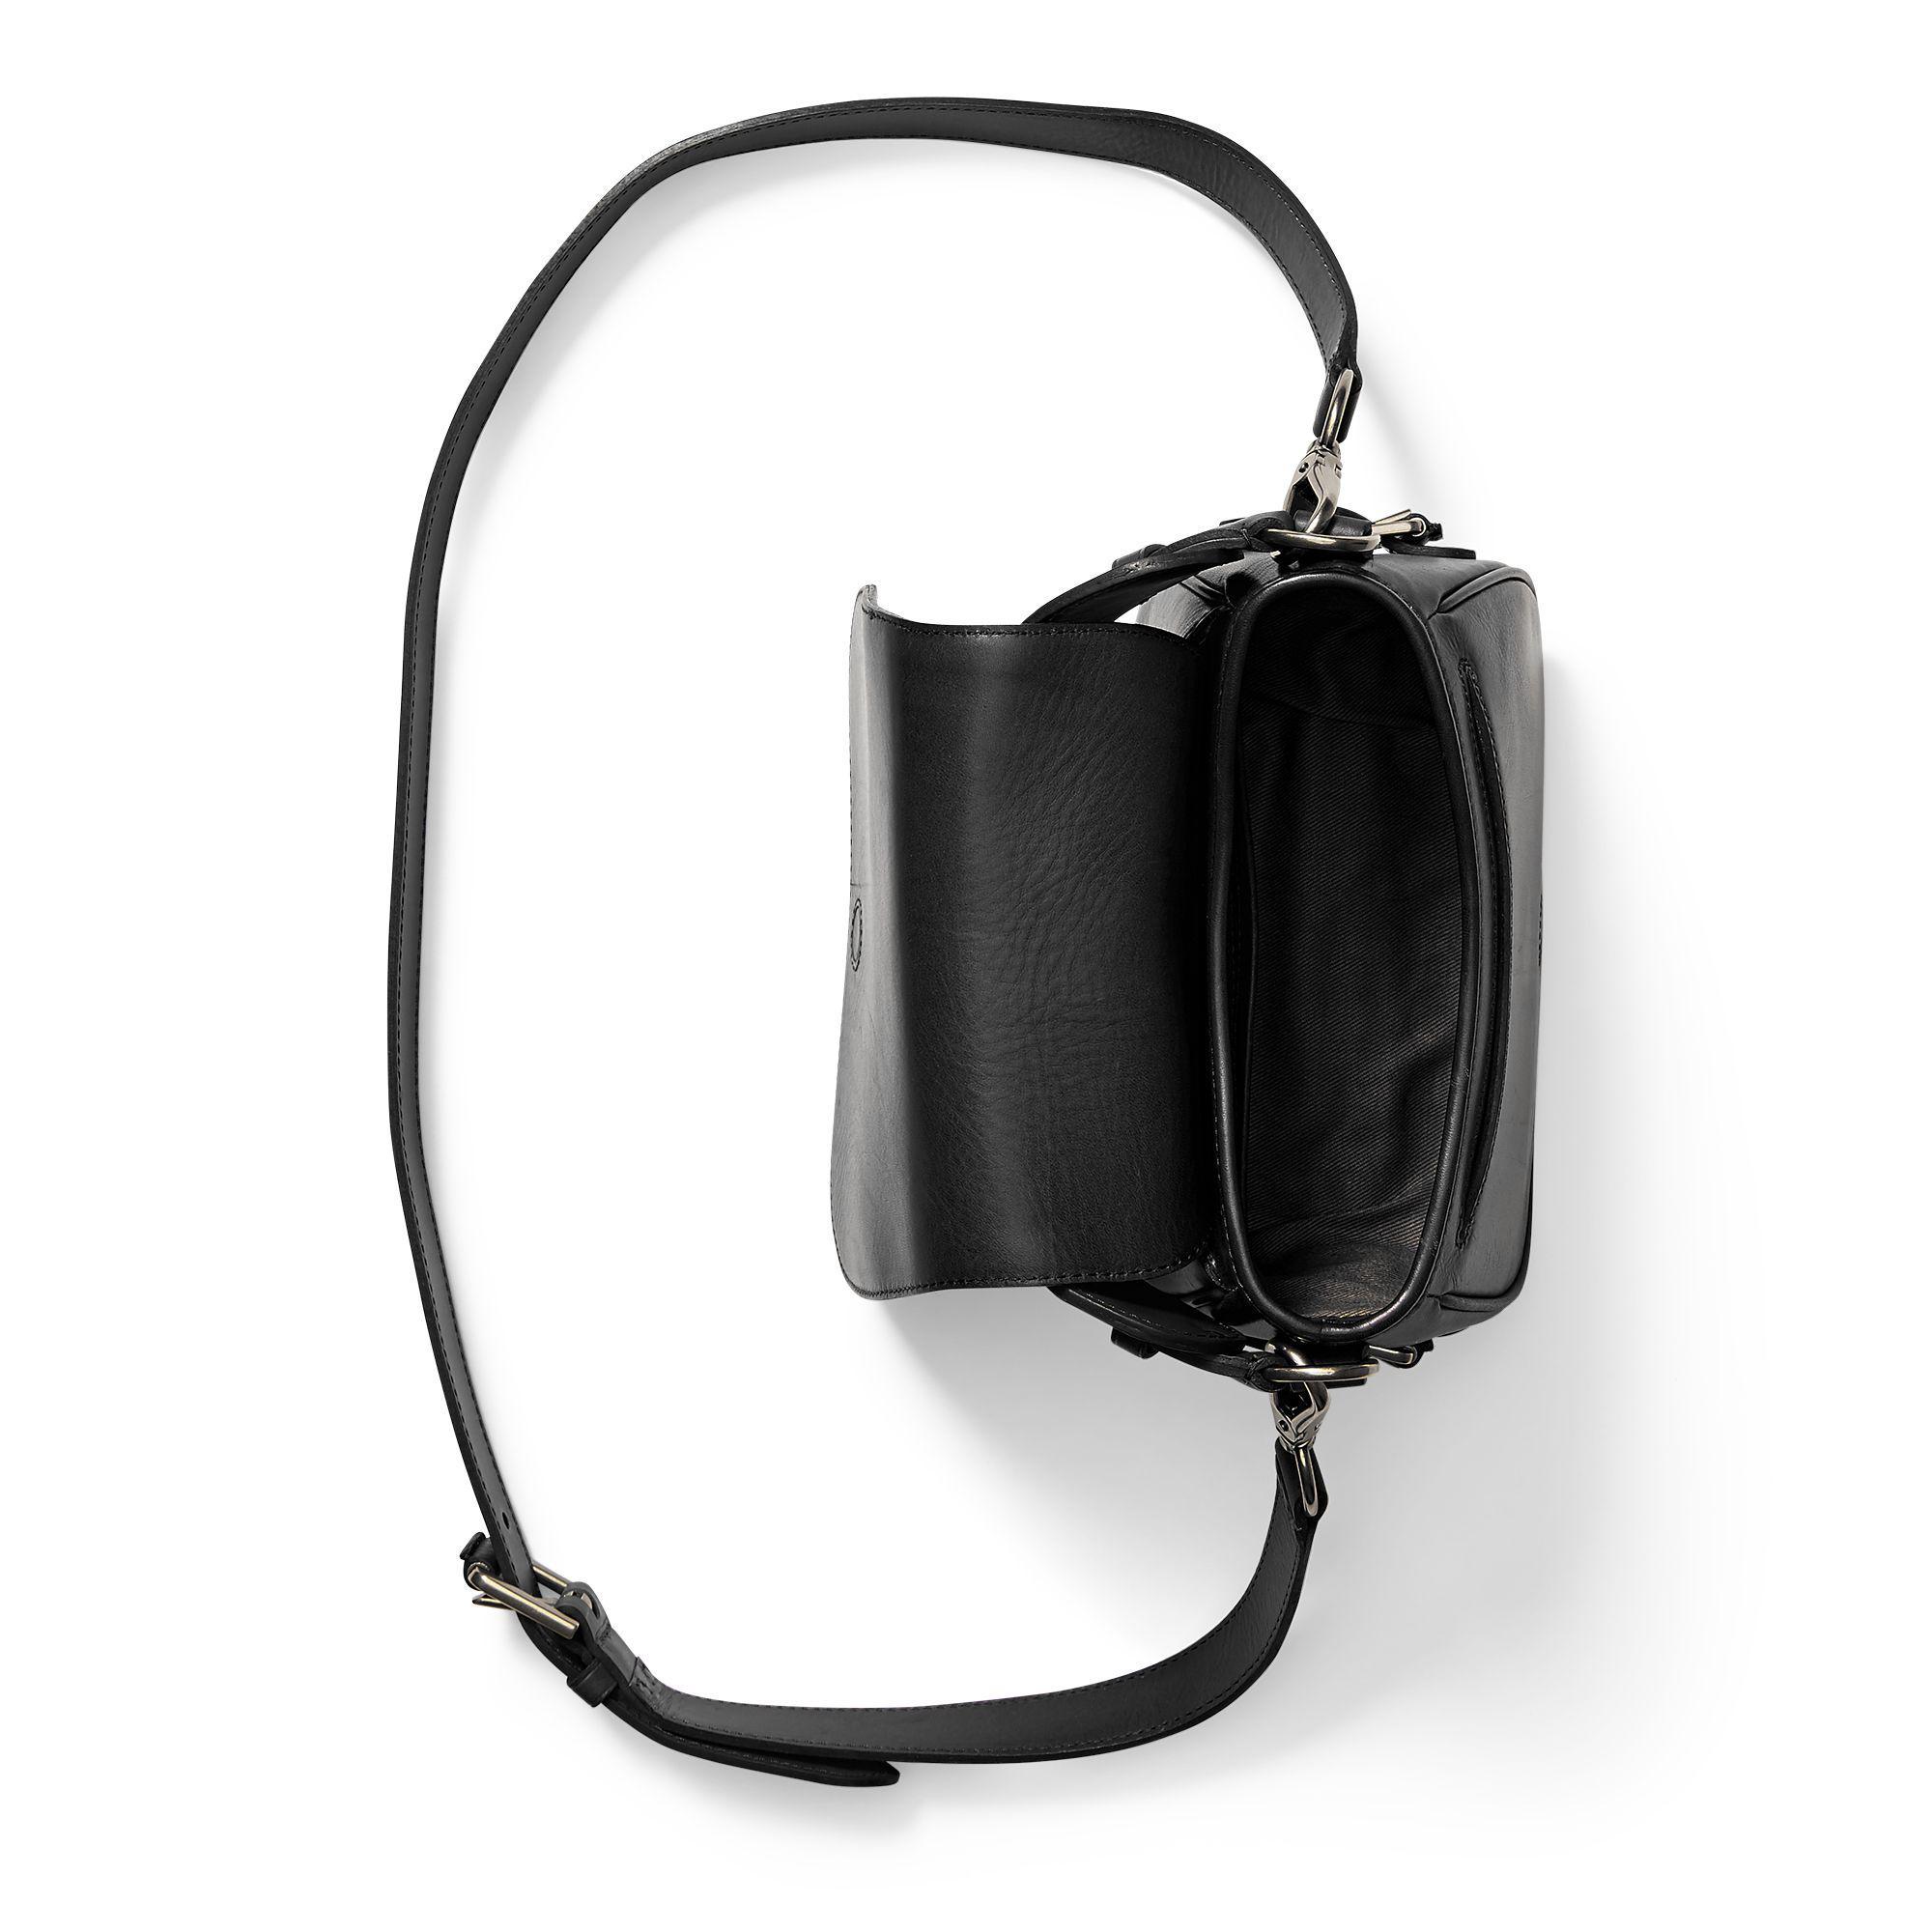 0a1672c9ed9 Polo Ralph Lauren Small Sullivan Saddle Bag in Black - Lyst